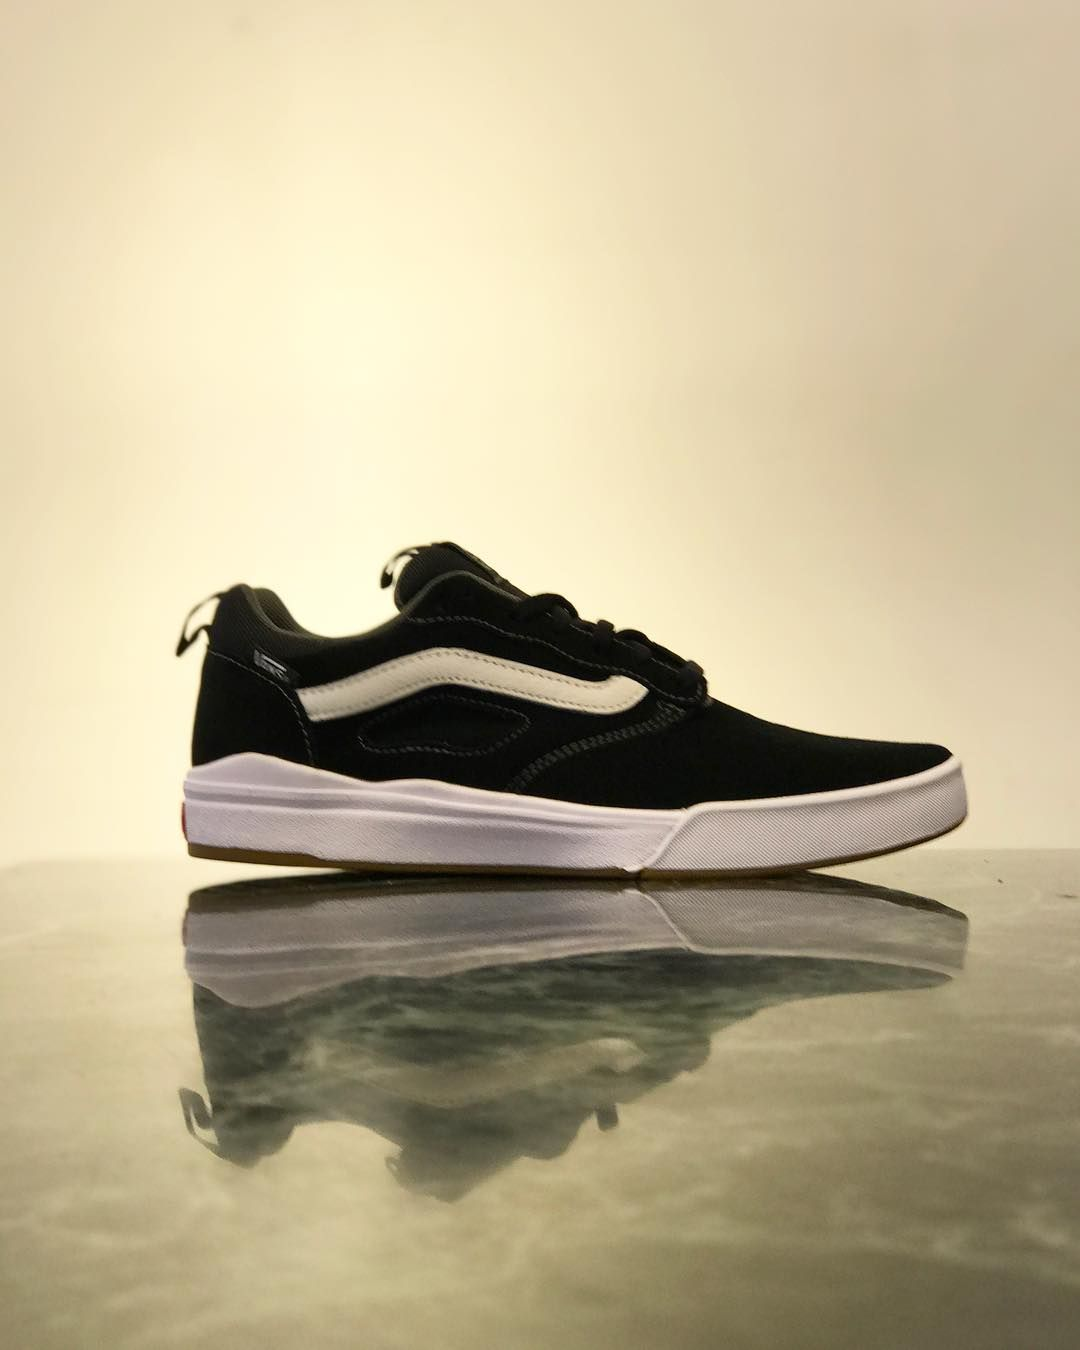 Vans, Vans shoes, Sneakers